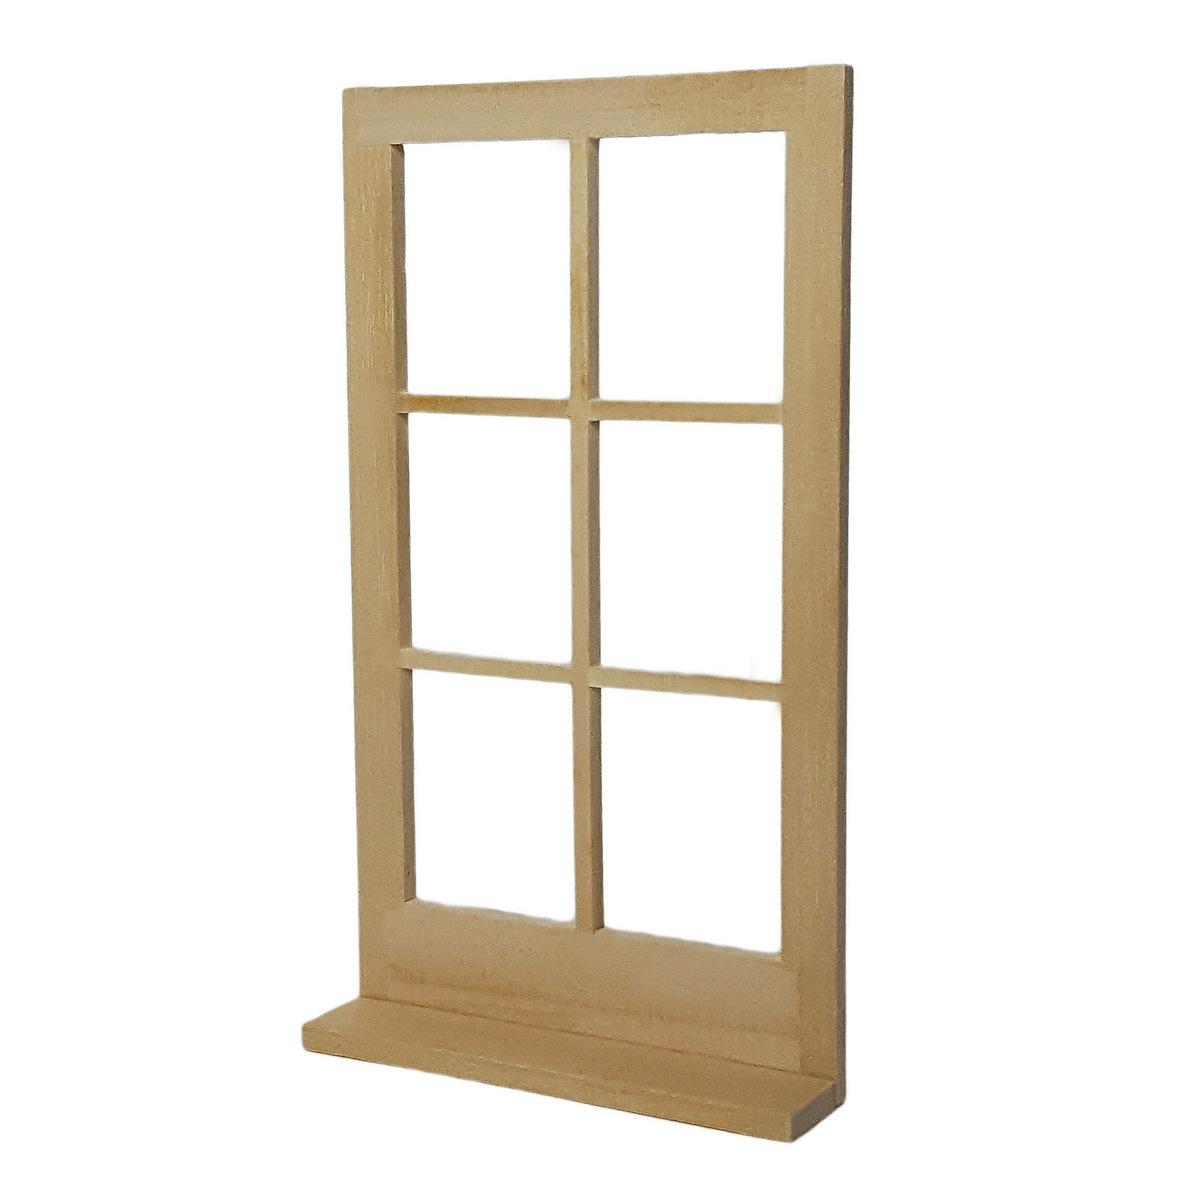 Mock window, ideal for the MODULE BOX